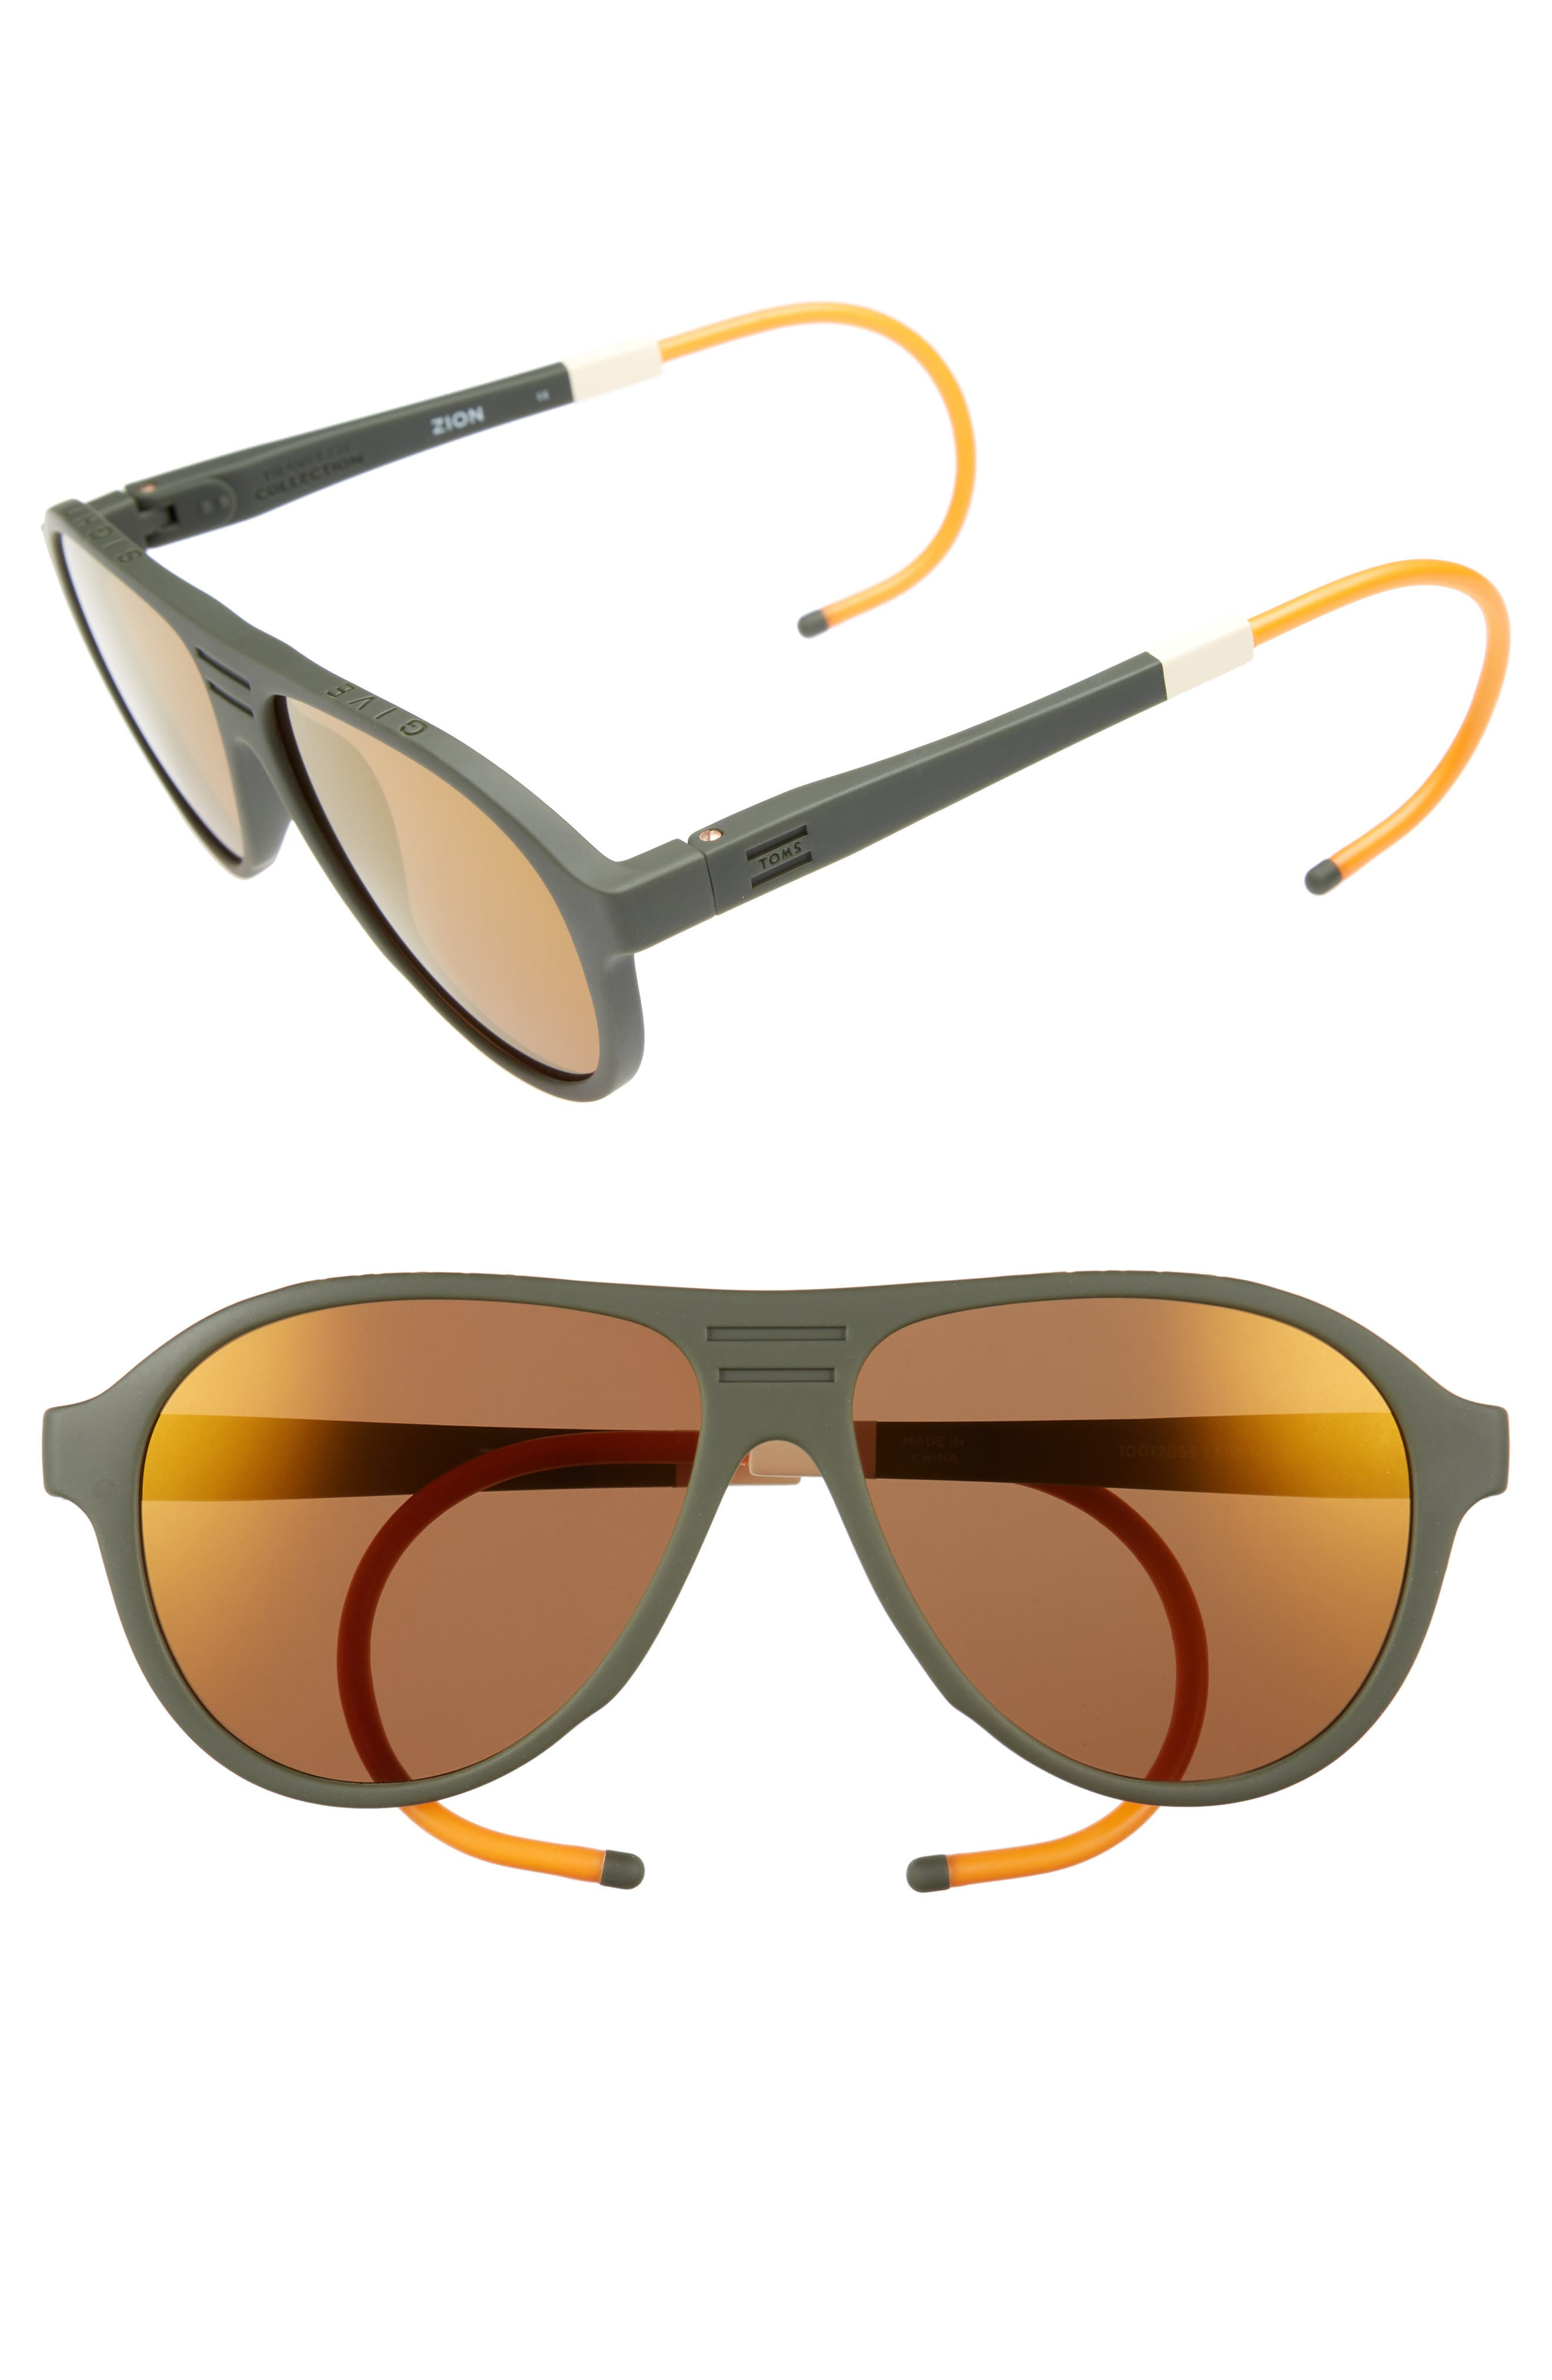 Traveler Zion 57mm Aviator Sunglasses,                             Main thumbnail 1, color,                             Matte Rifle Green/ Gold Mirror